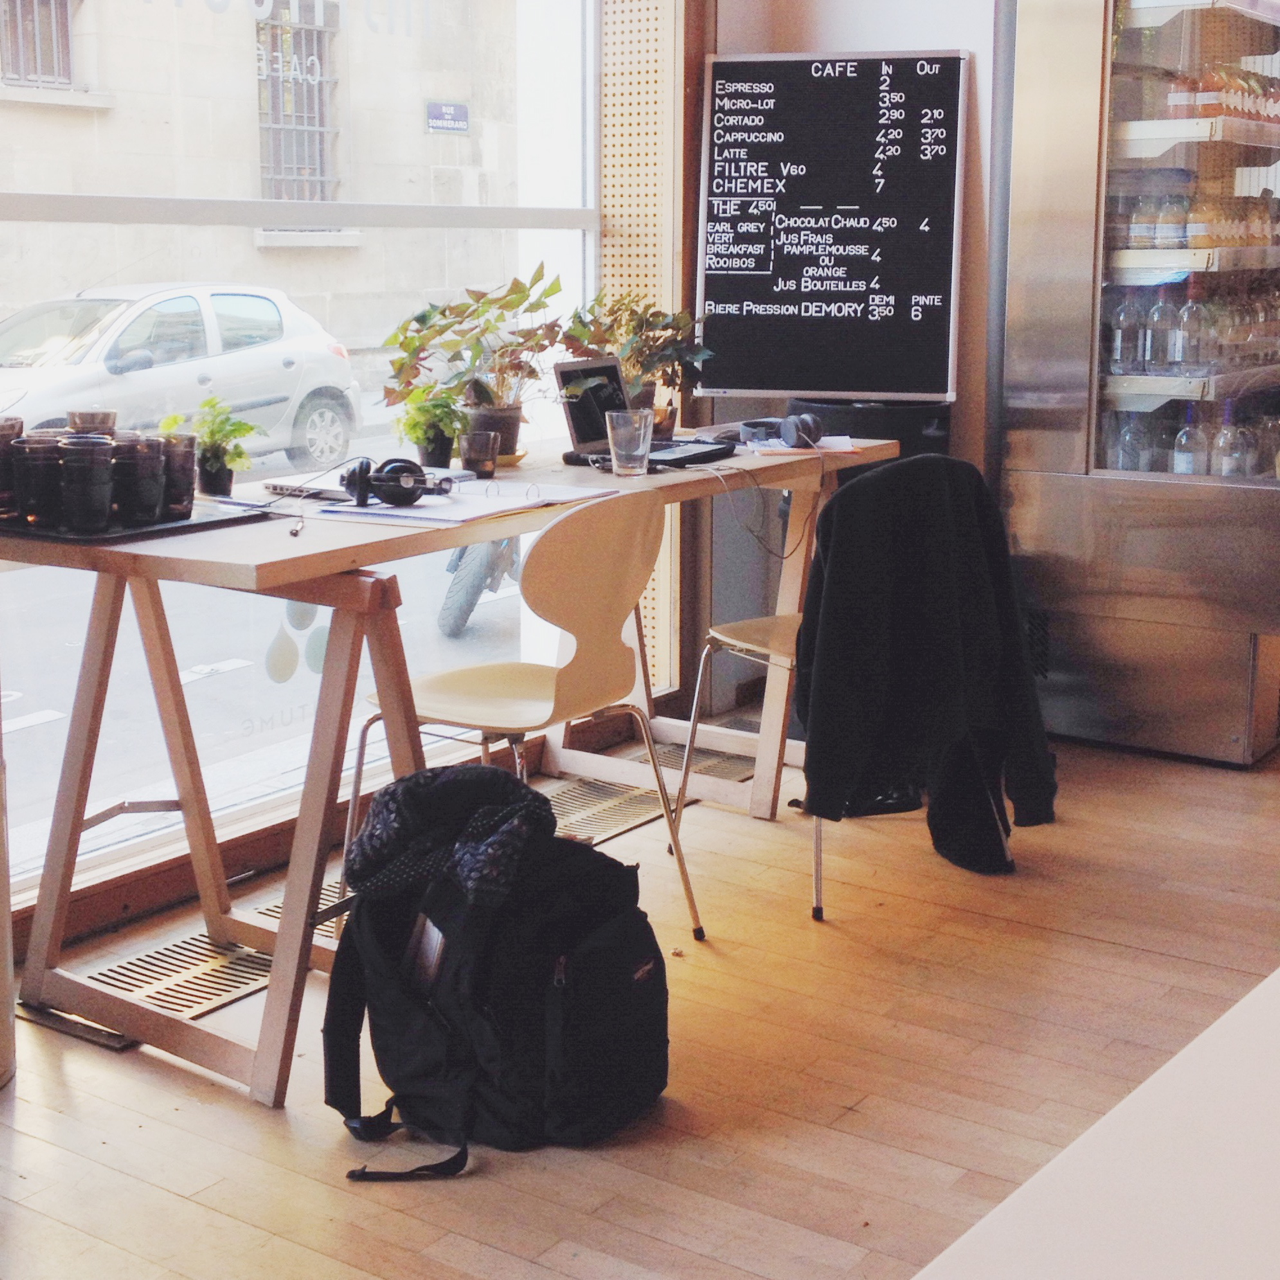 Cafe Sympa Rue Des Ecoles